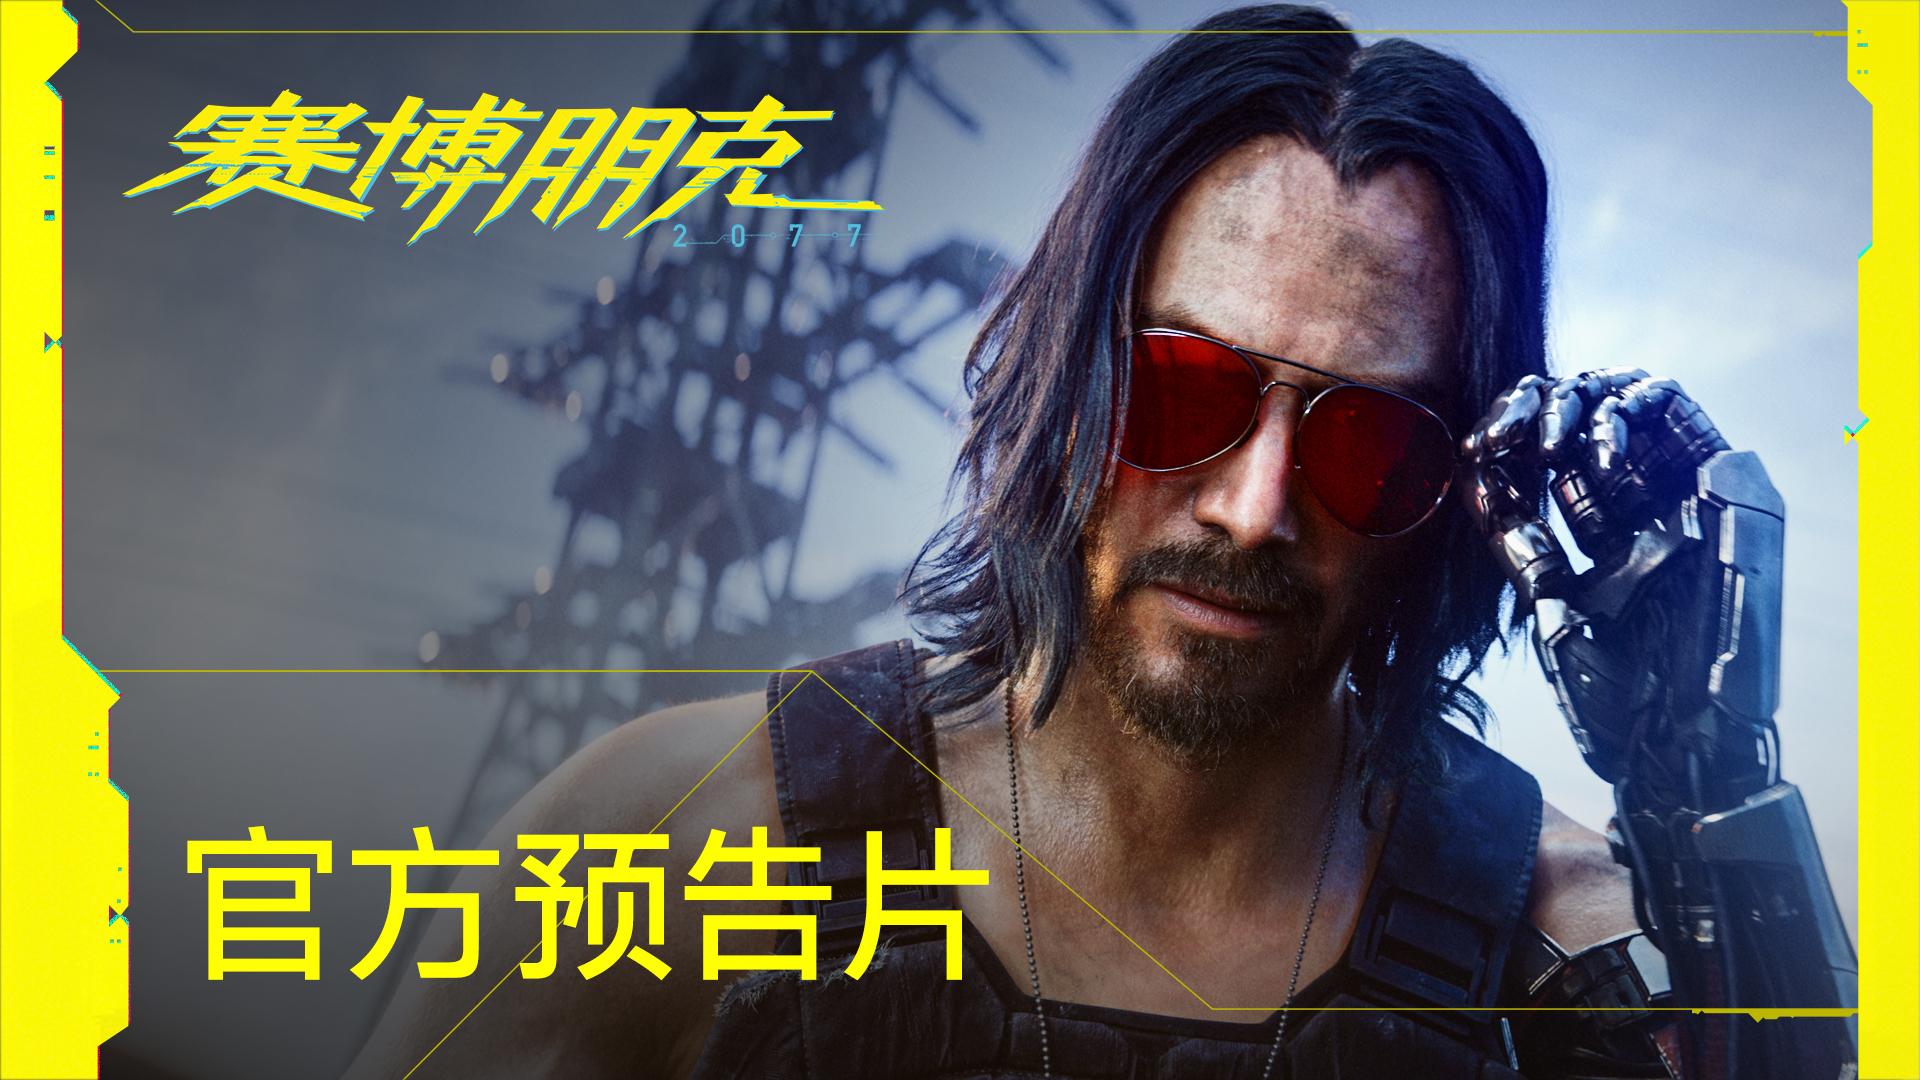 E3:《赛博朋克2077》2020年4月16日发售 支持简体中文